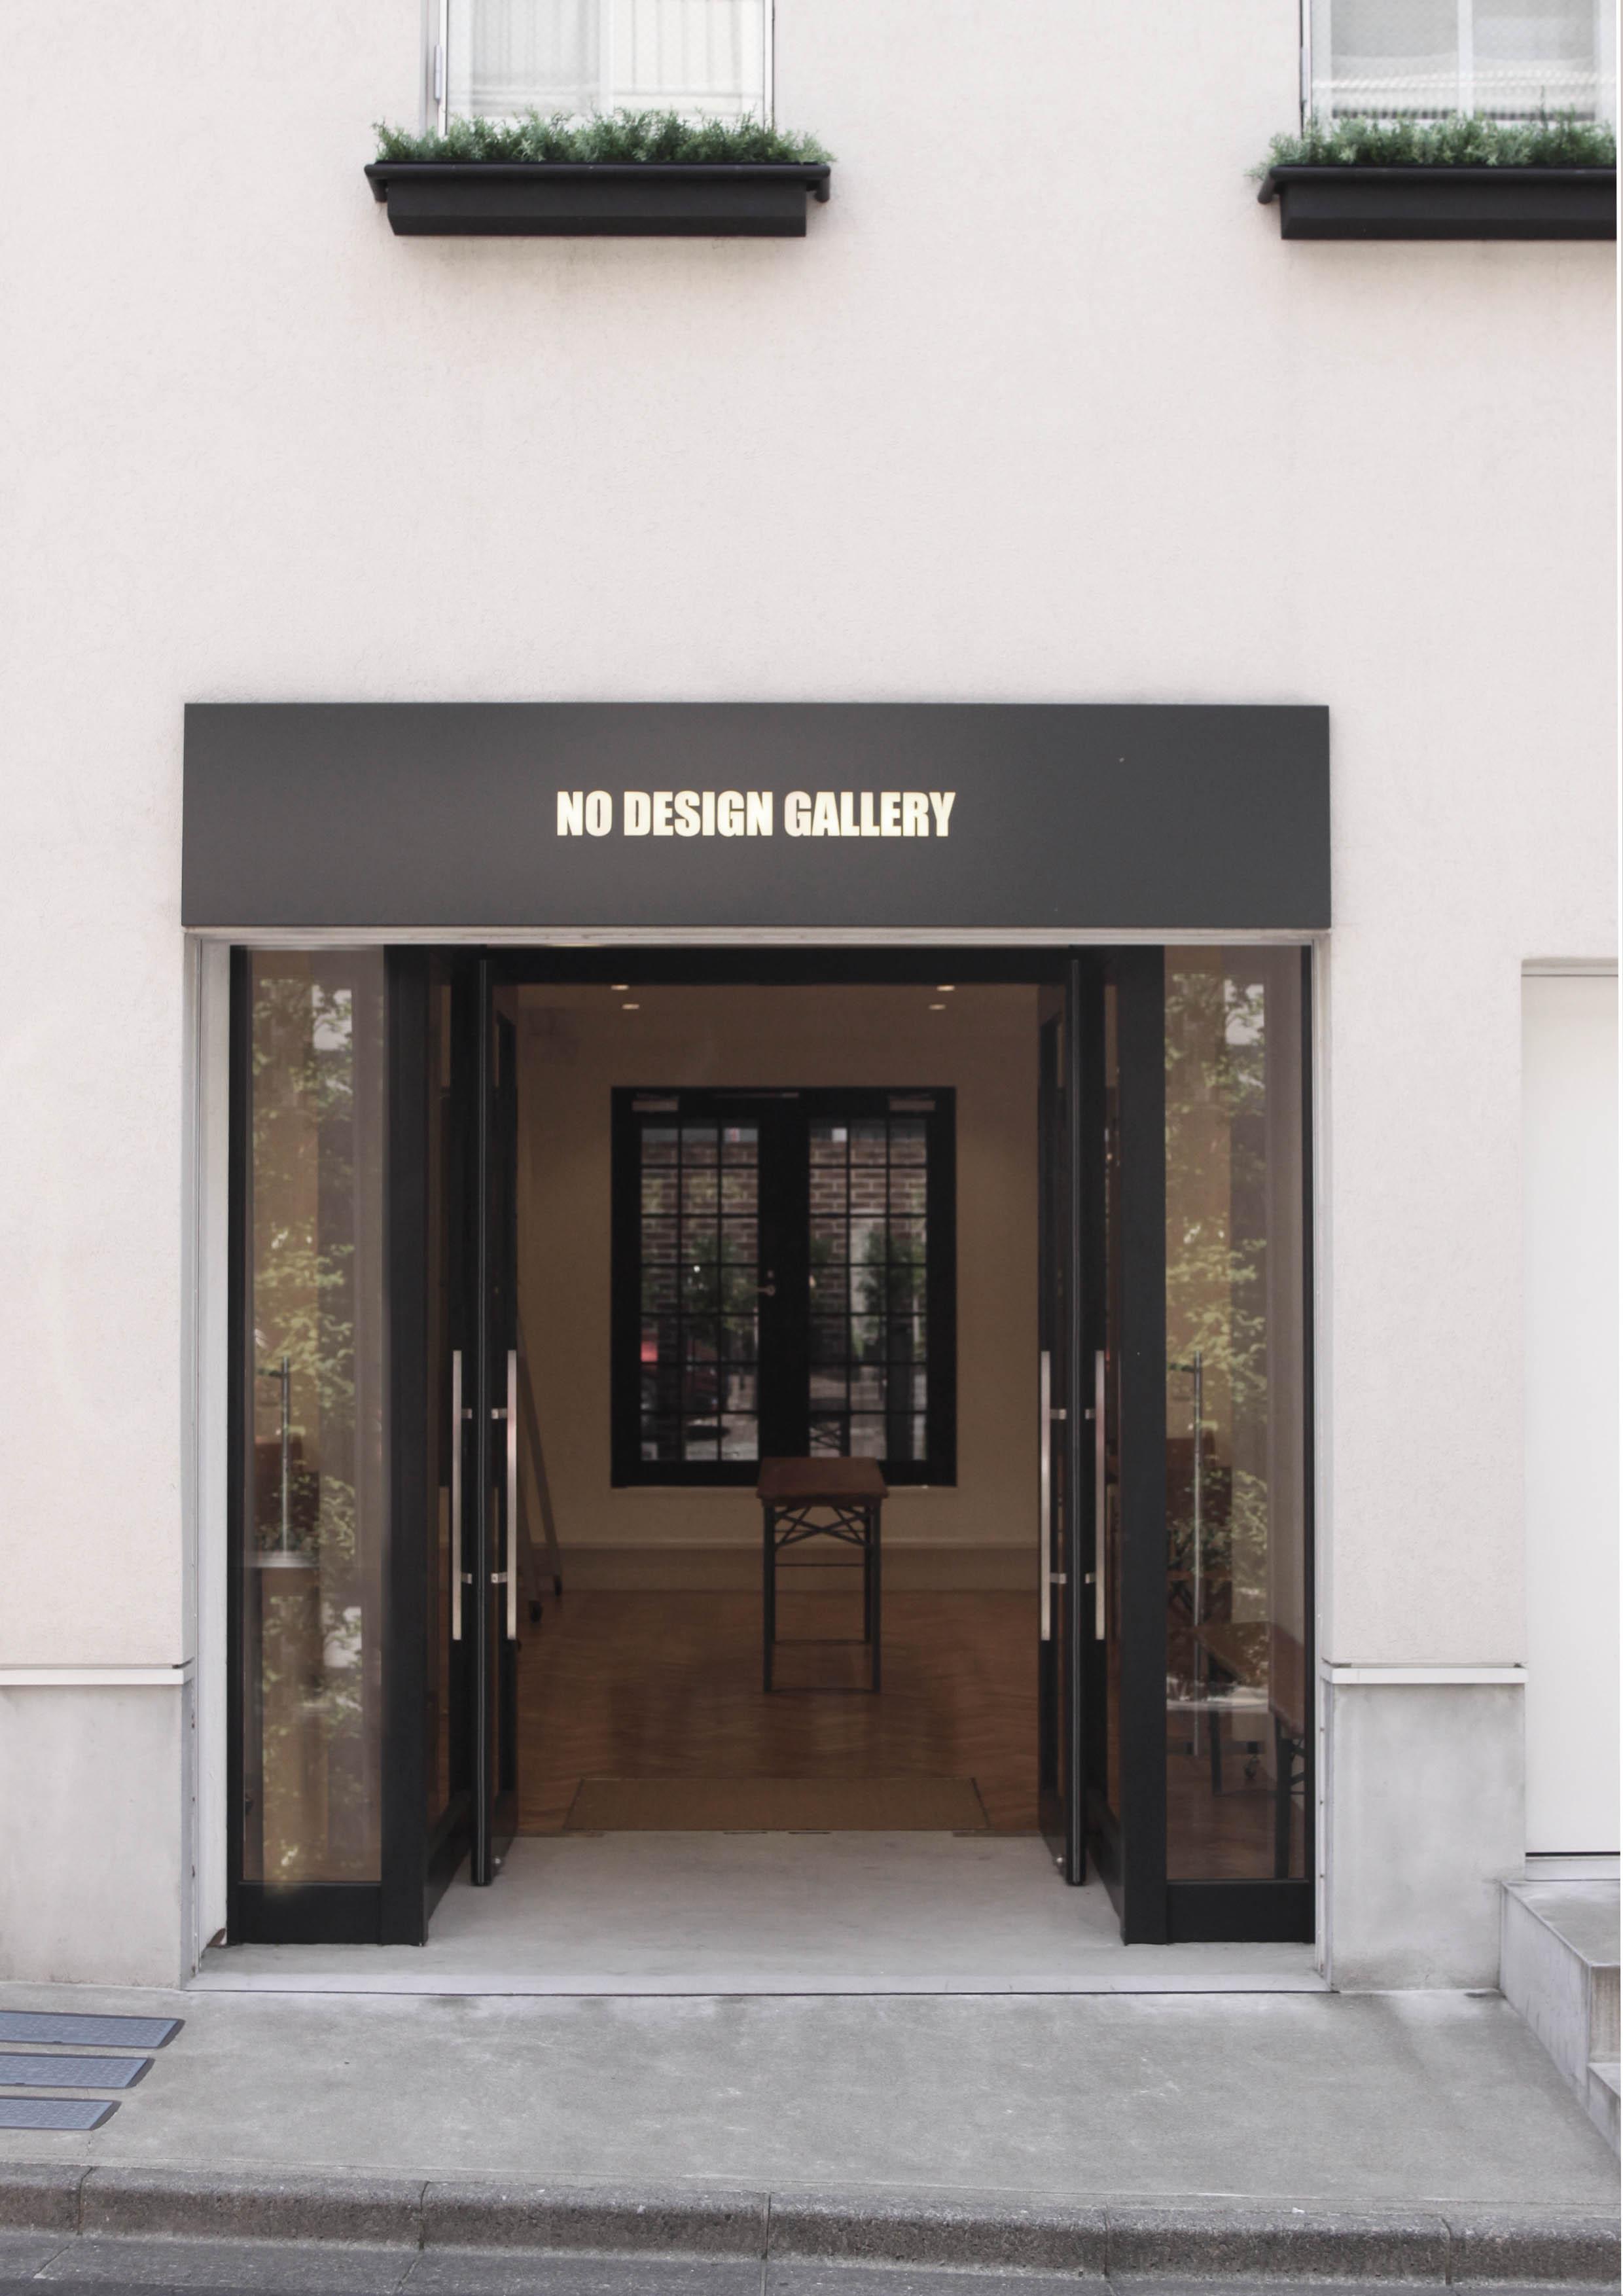 minami gallery no design gallery レンタルスペース